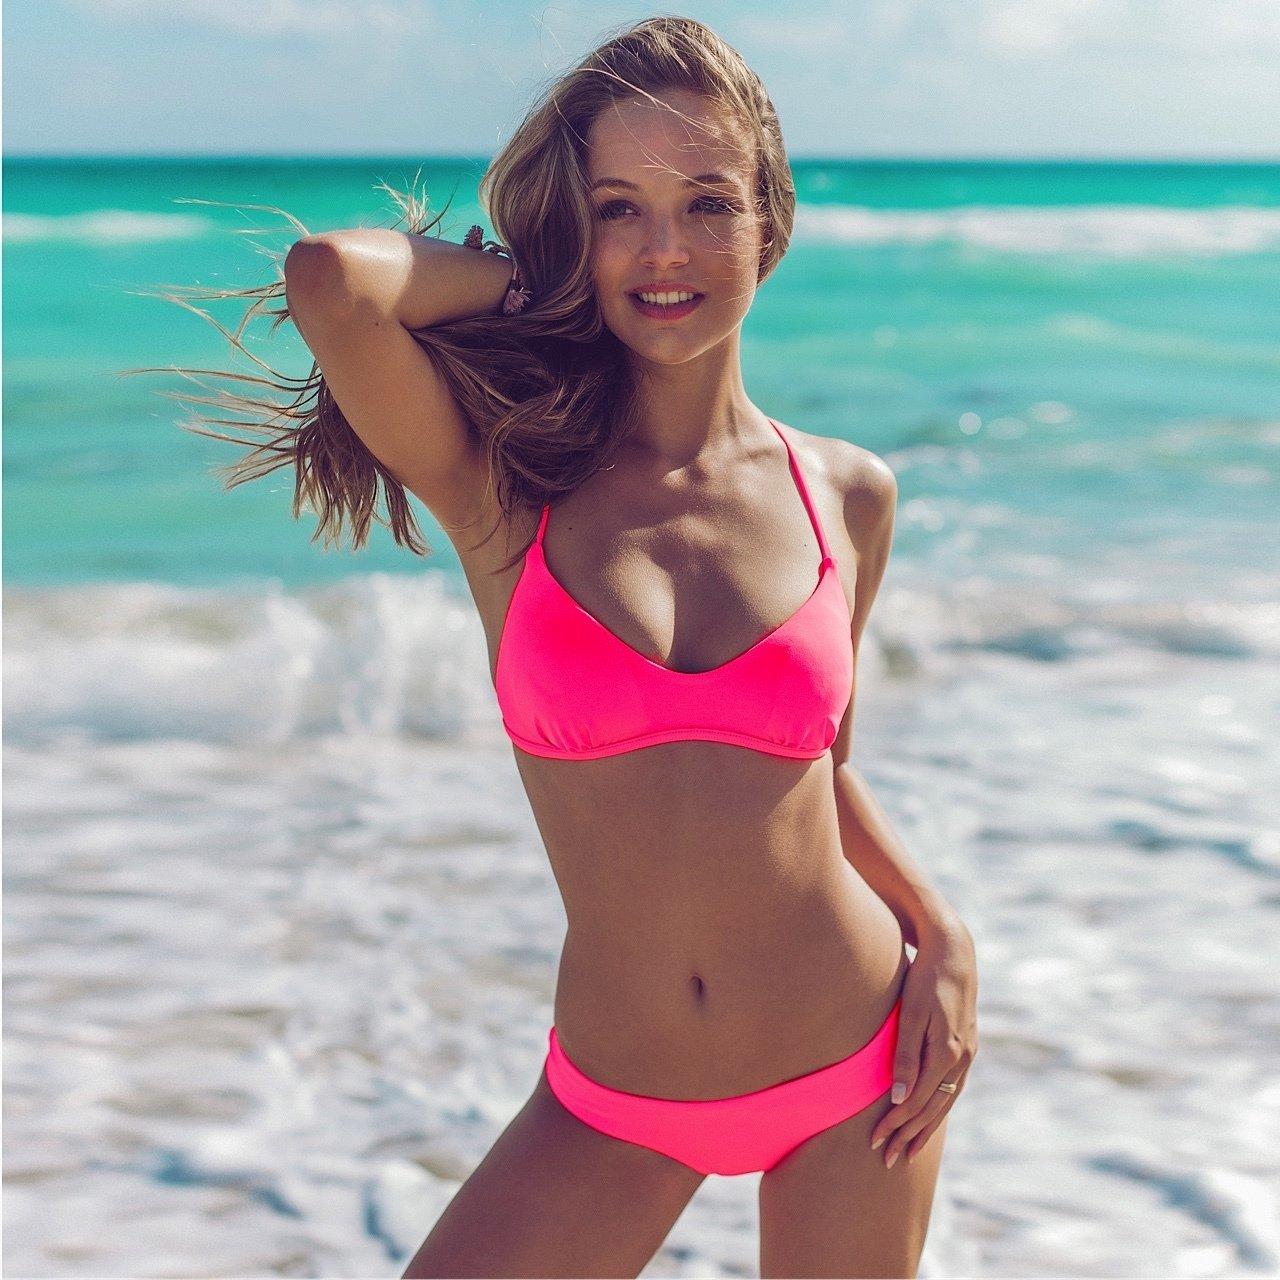 Bikini girl in distress, short and skinny porn girls